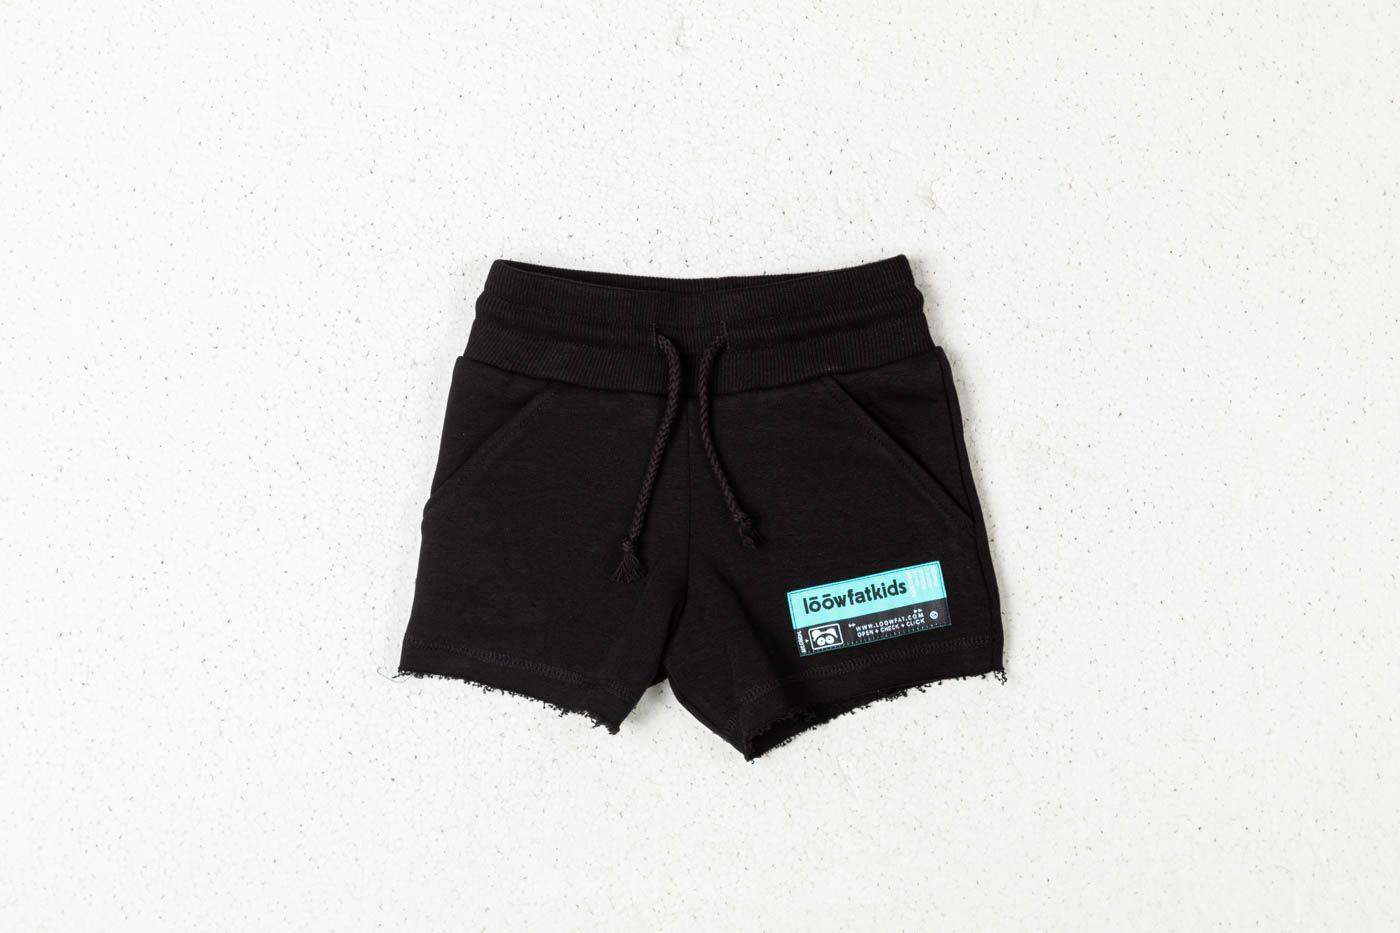 LoowFAT KIDS Trend Shorts